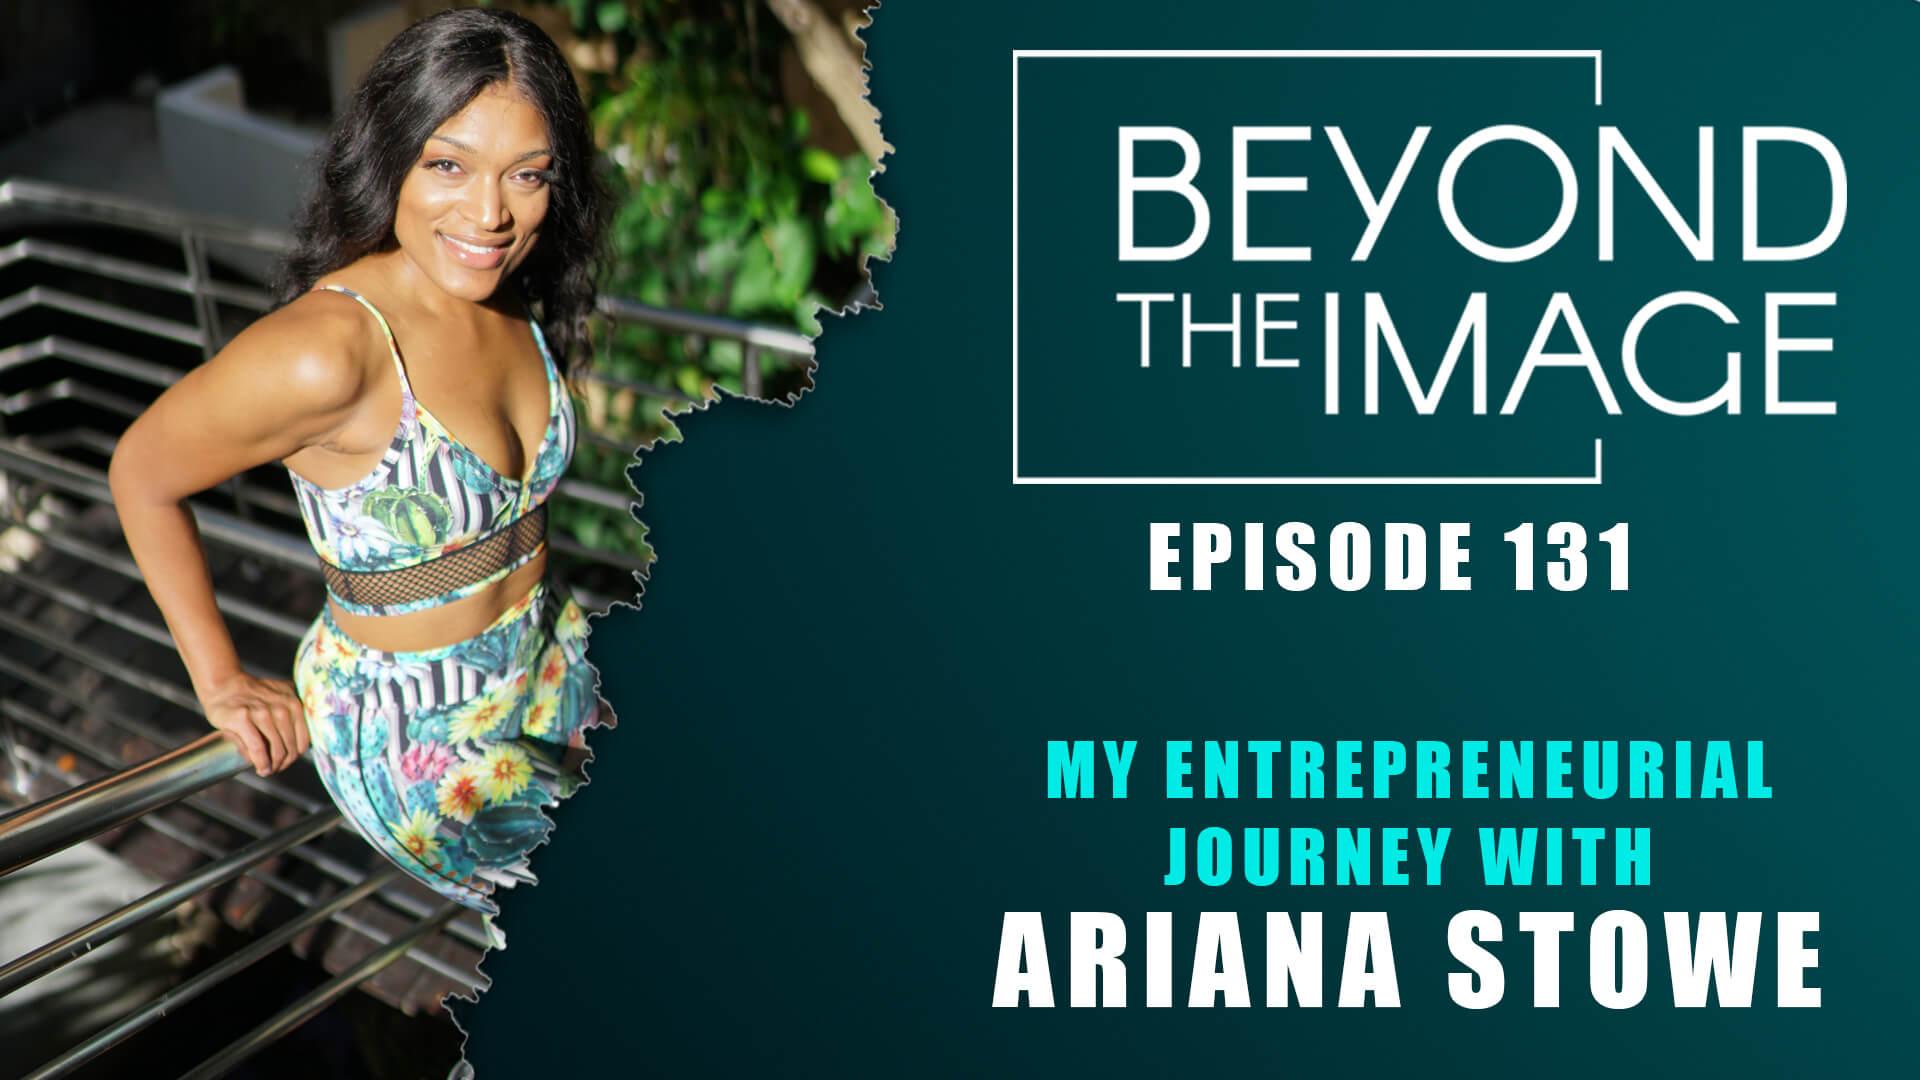 BTI #131: My Entrepreneurial Journey with Ariana Stowe